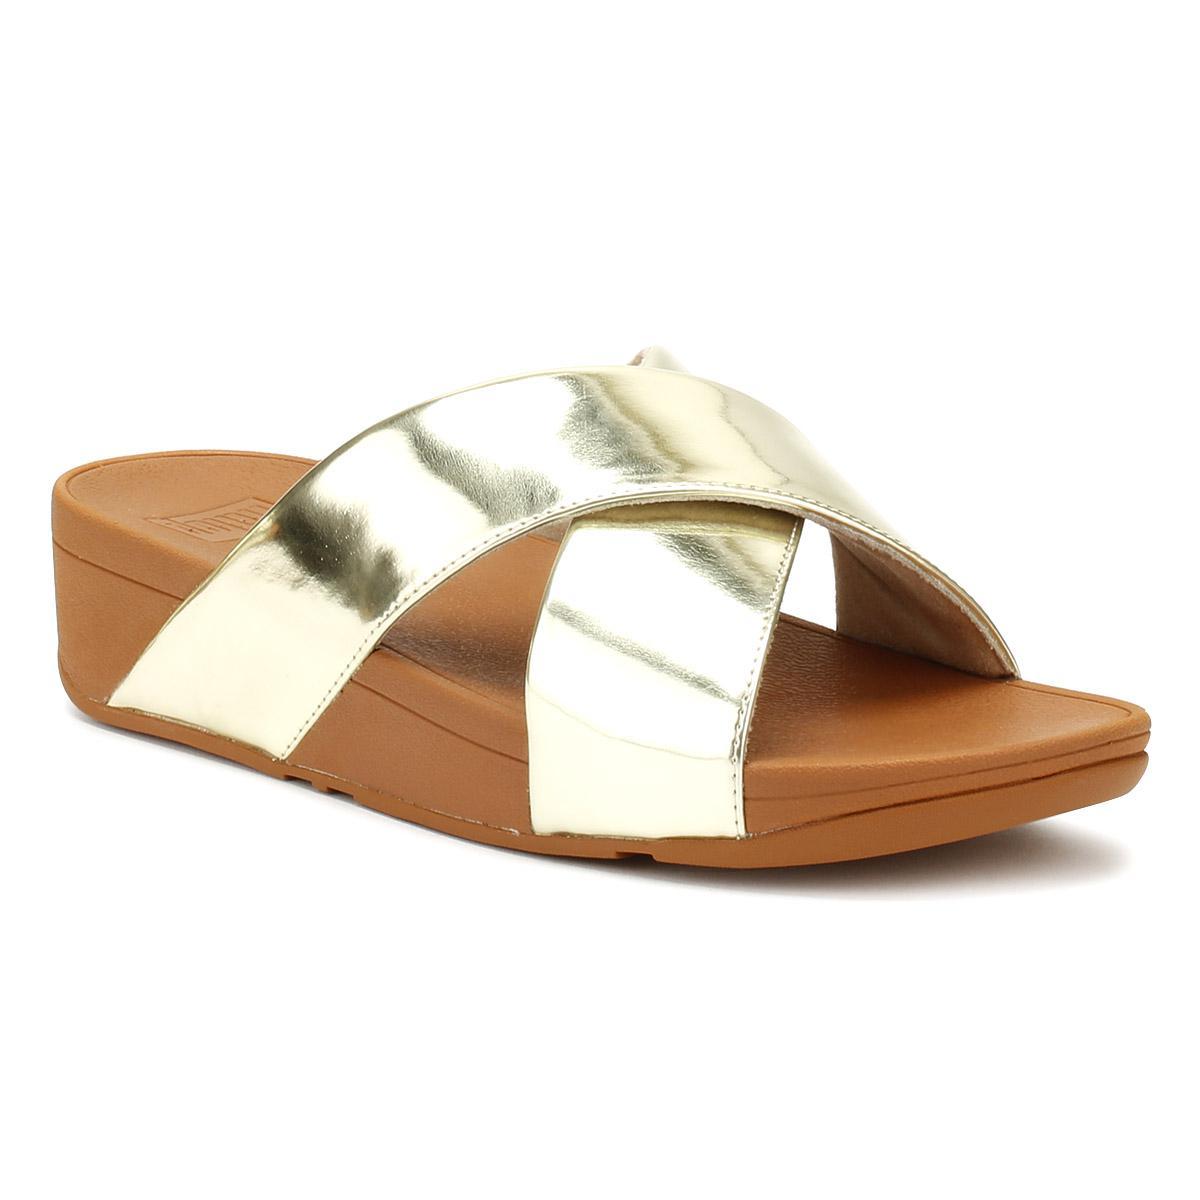 bdc12a7f87876 Fitflop Womens Gold Mirror Lulutm Cross Slide Sandals in Metallic - Lyst